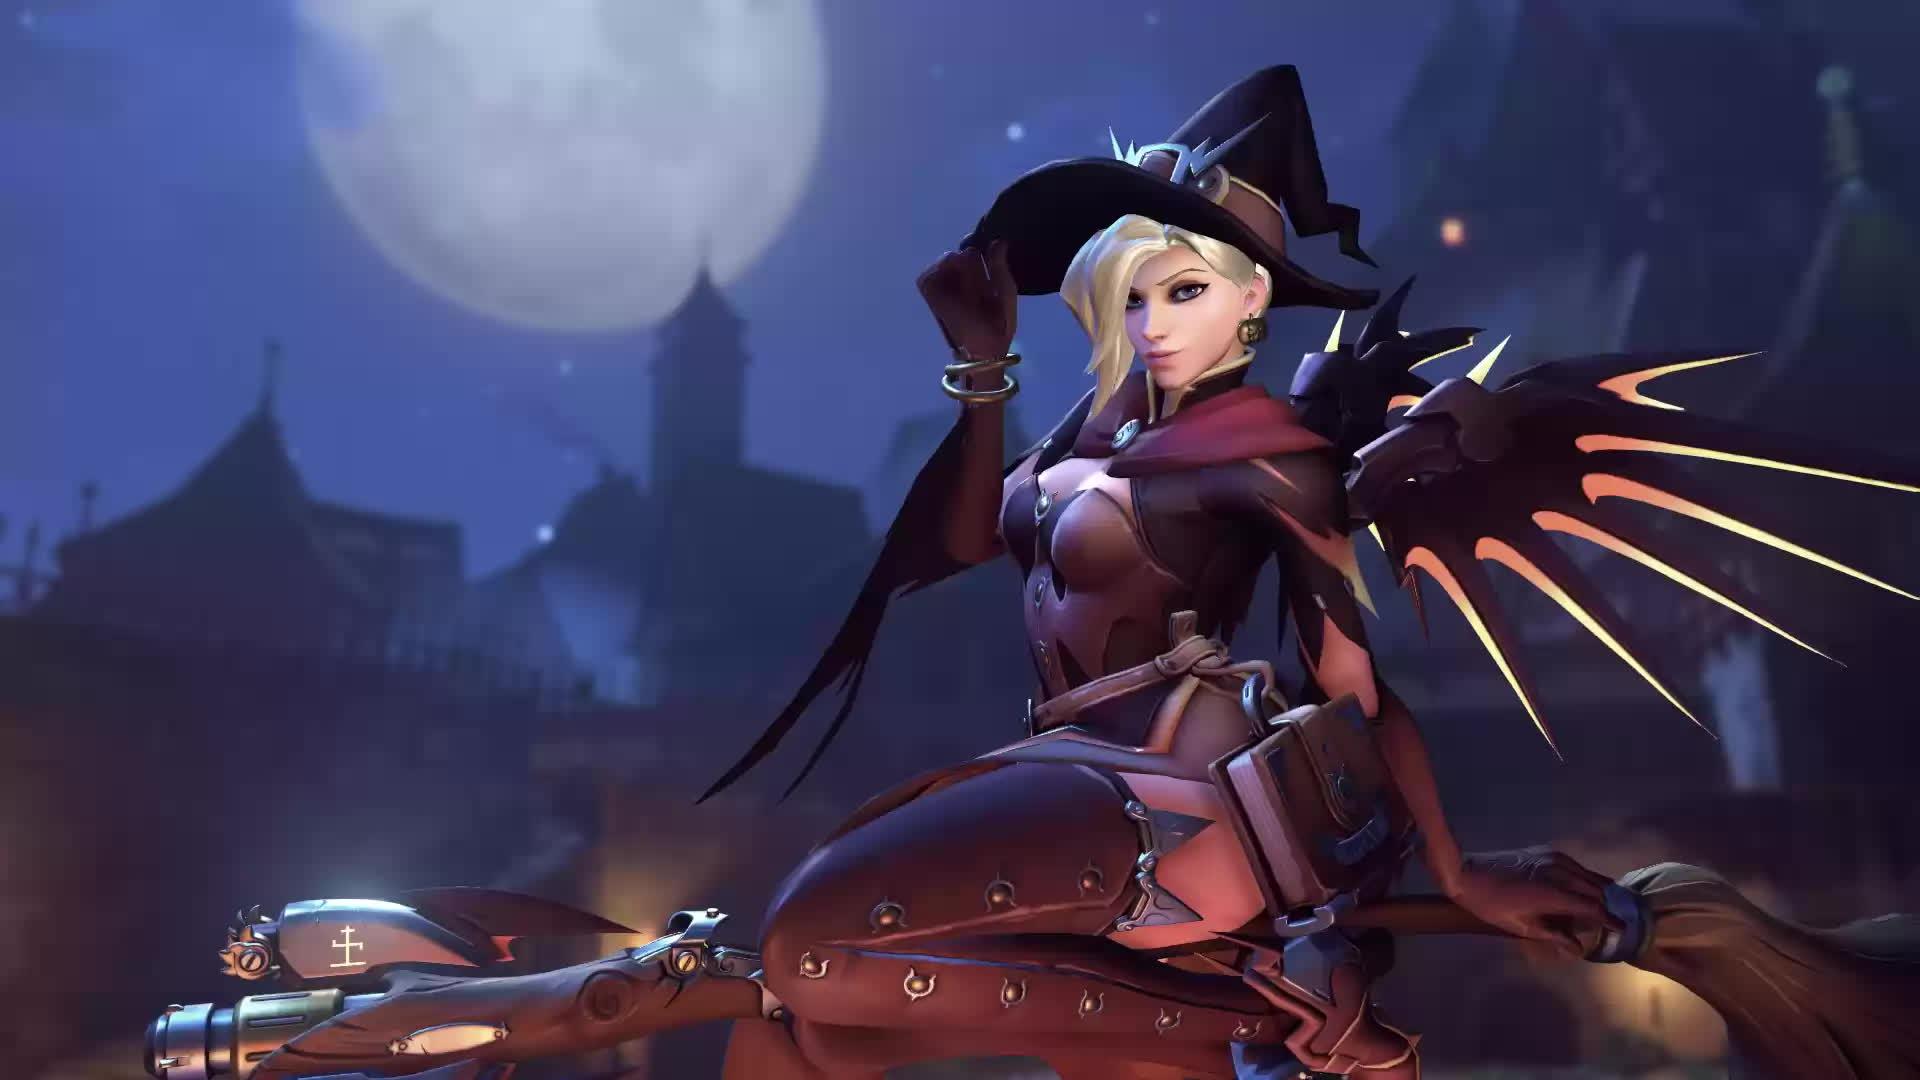 Overwatch Mercy Riding Sound Howlsfm Mobile